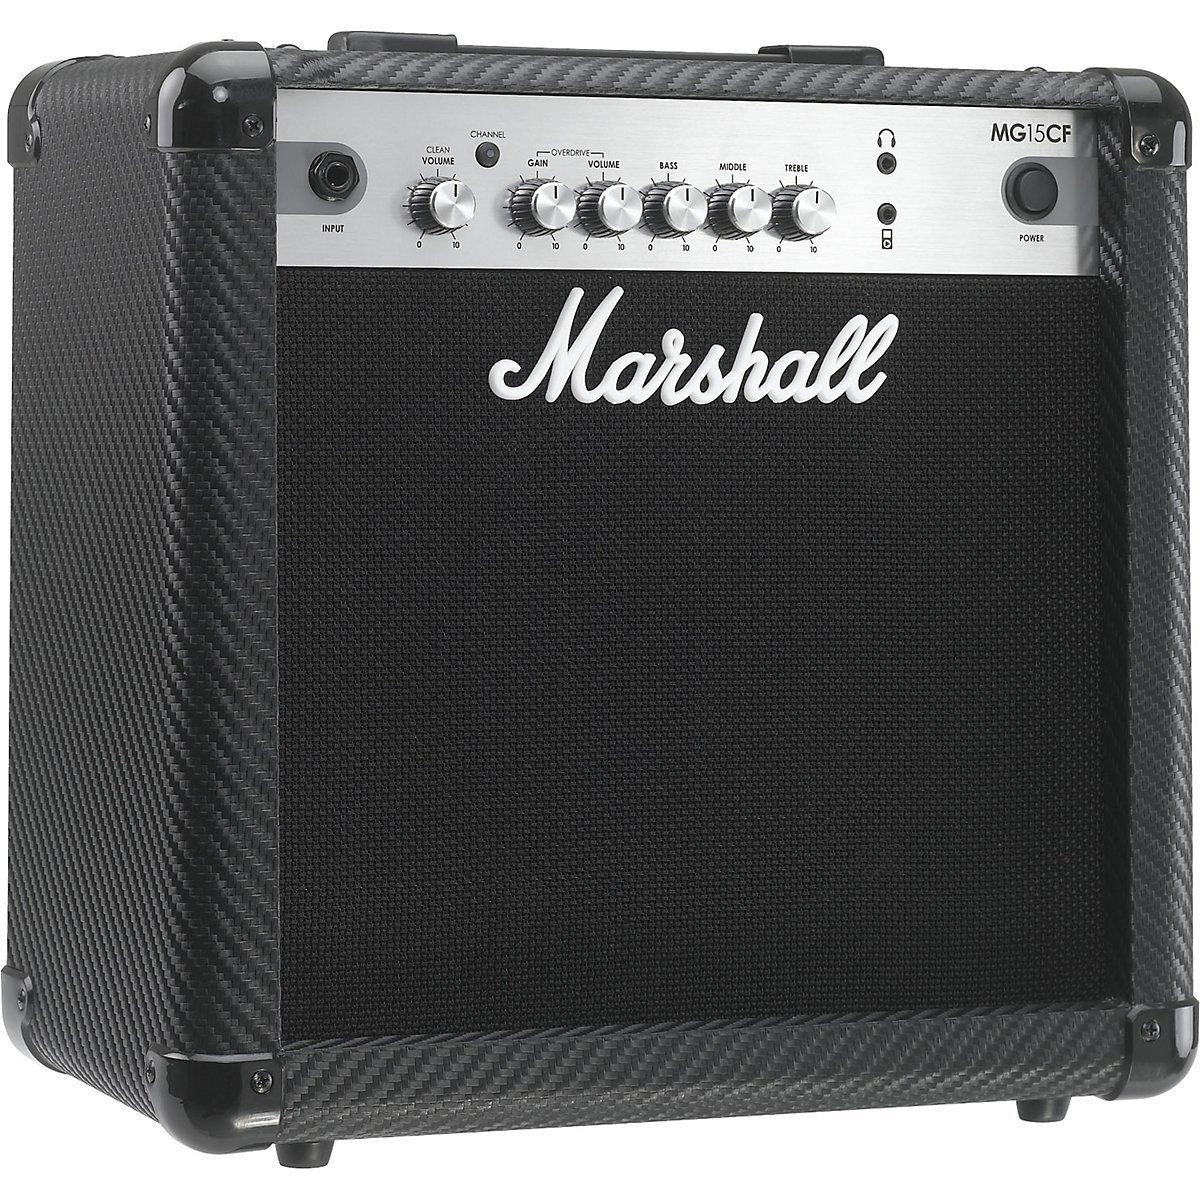 Marshall(マーシャル) 2ch コンボギターアンプ 15W MG15CF B005ODB36S